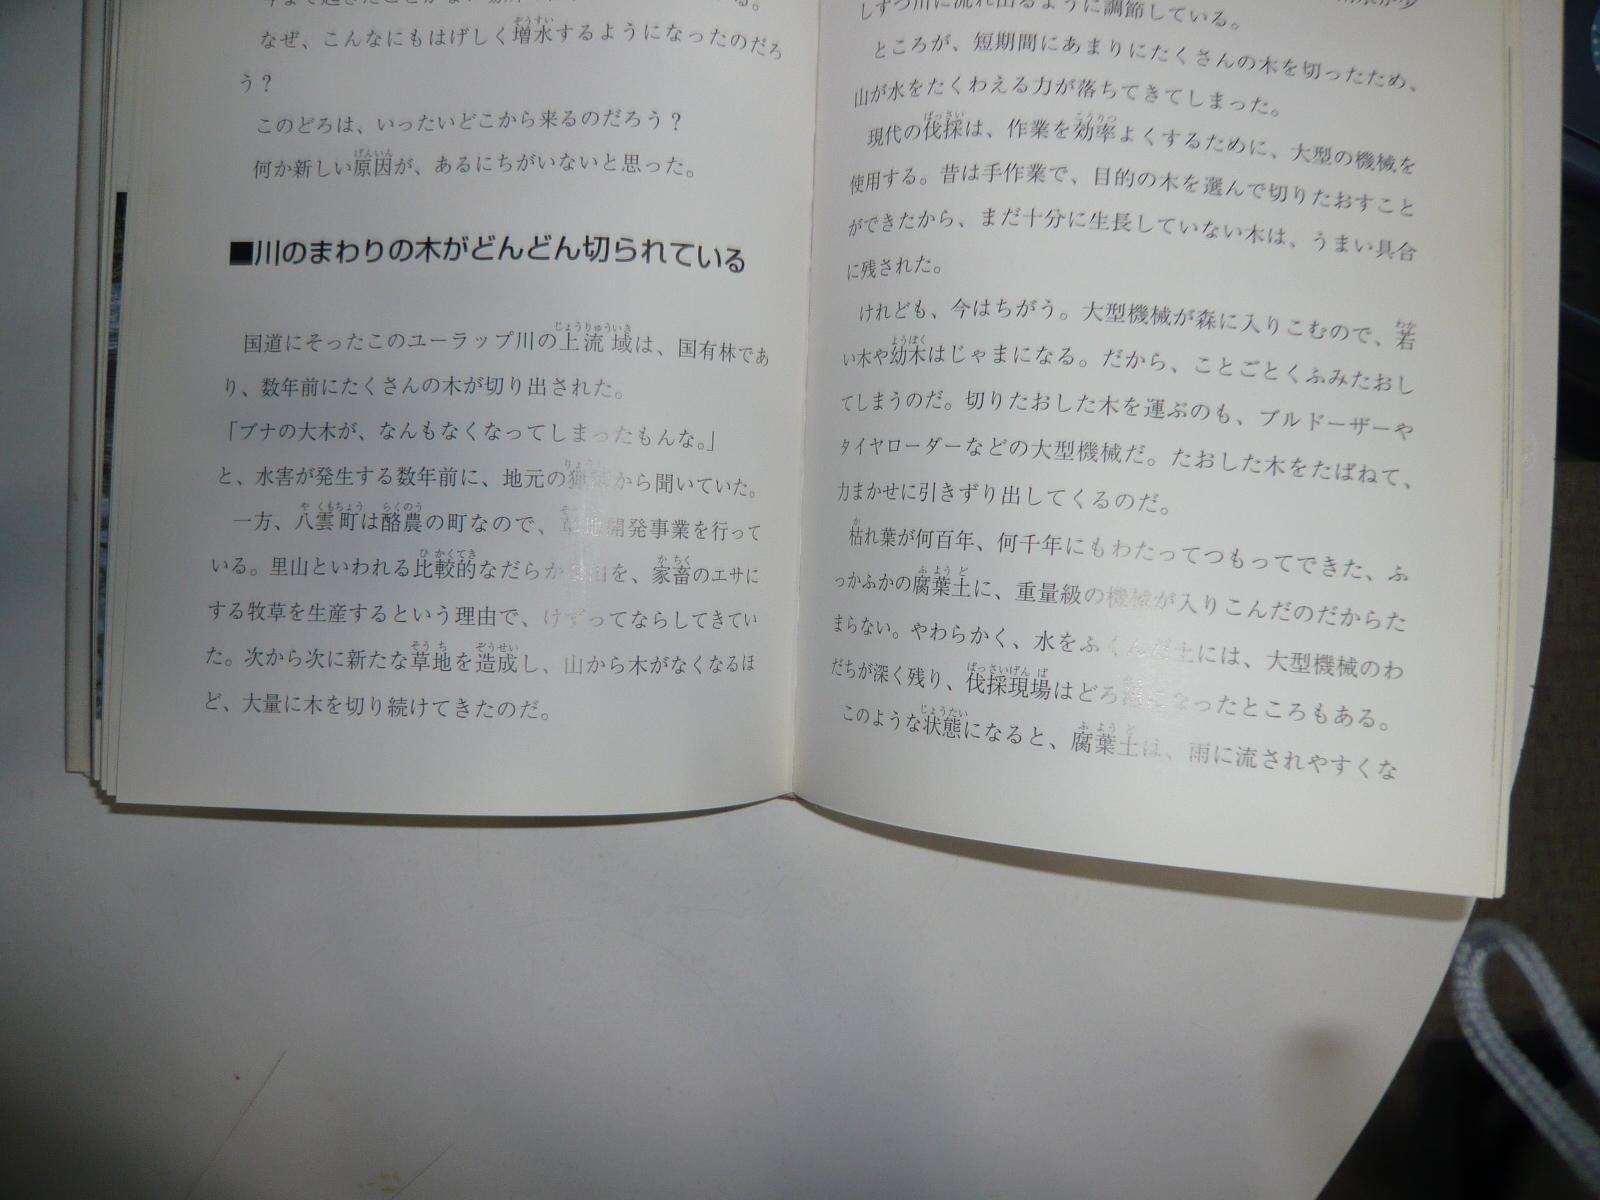 P1020290.jpg